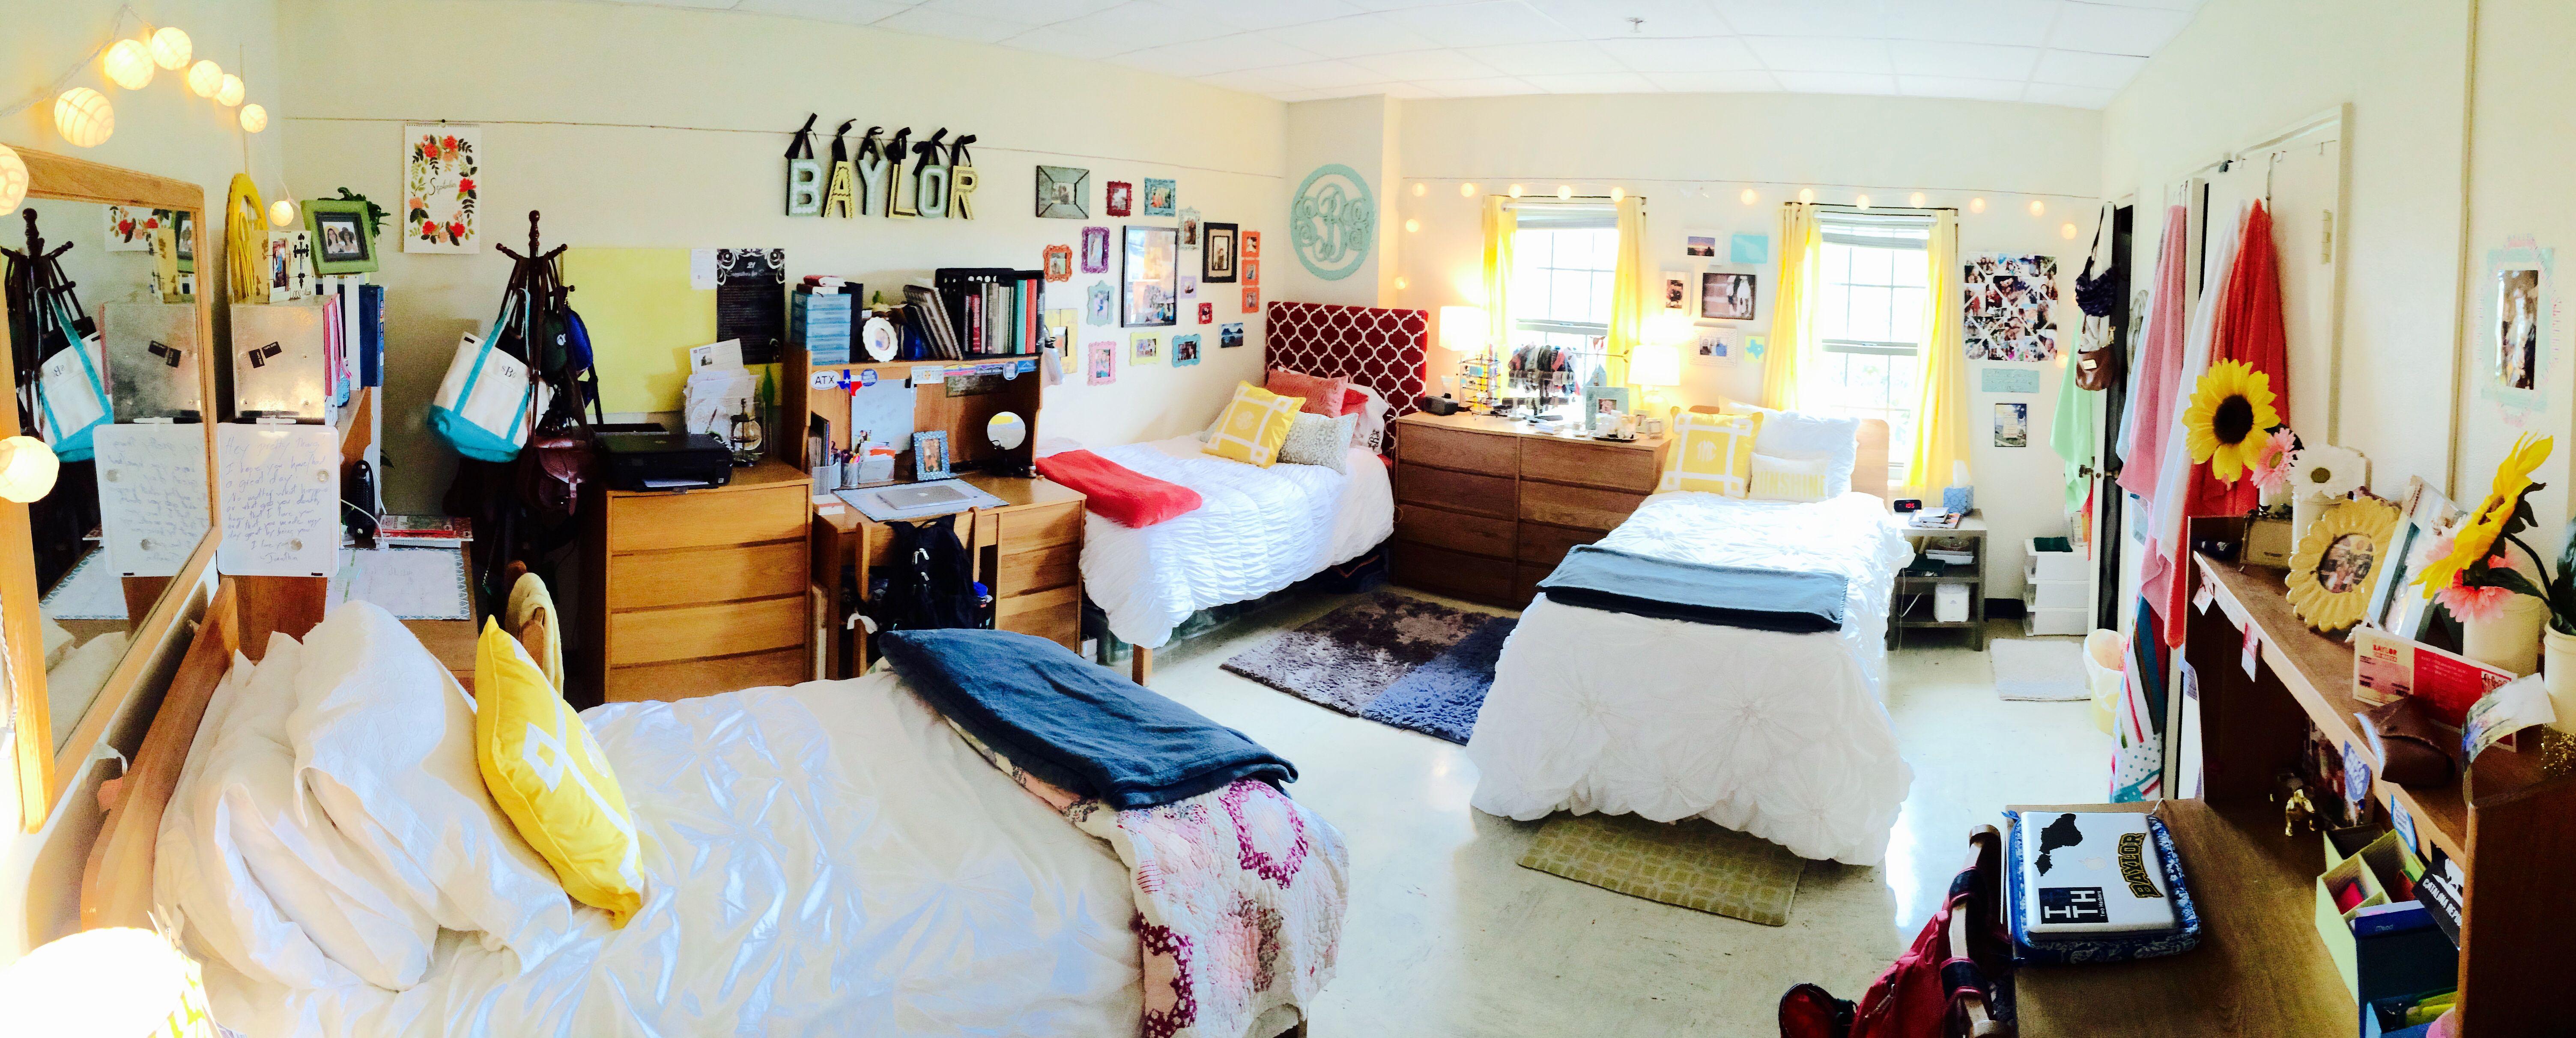 My Baylor Collins Dorm Room! | College bedroom decor, Dorm ...